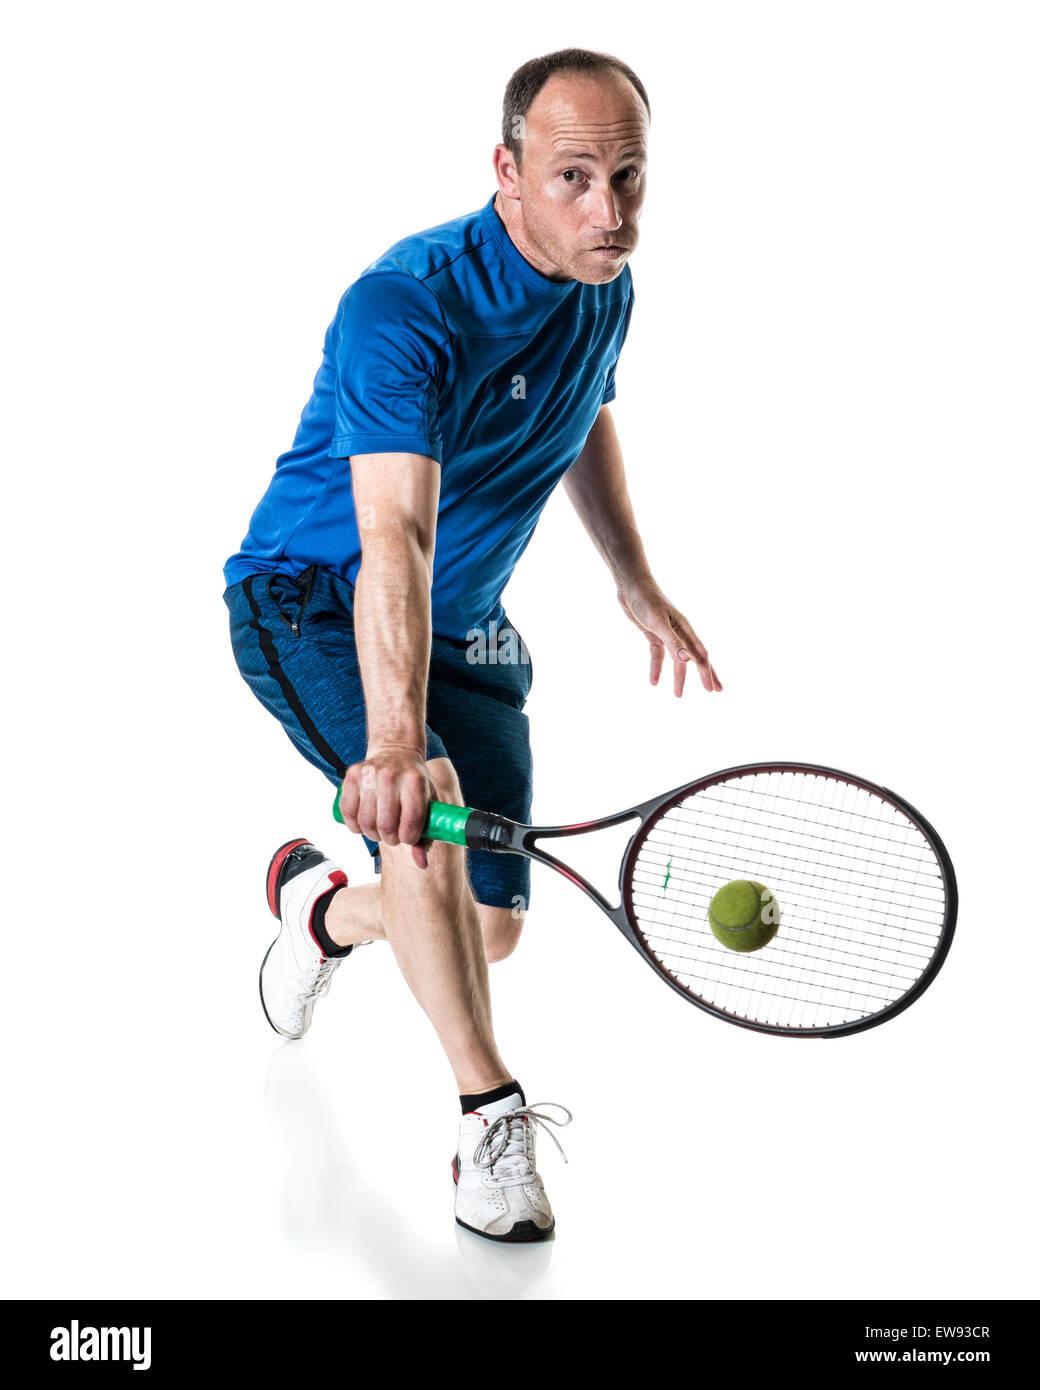 Tennis action shot. Backhand. Studio shot over white. - Stock Image